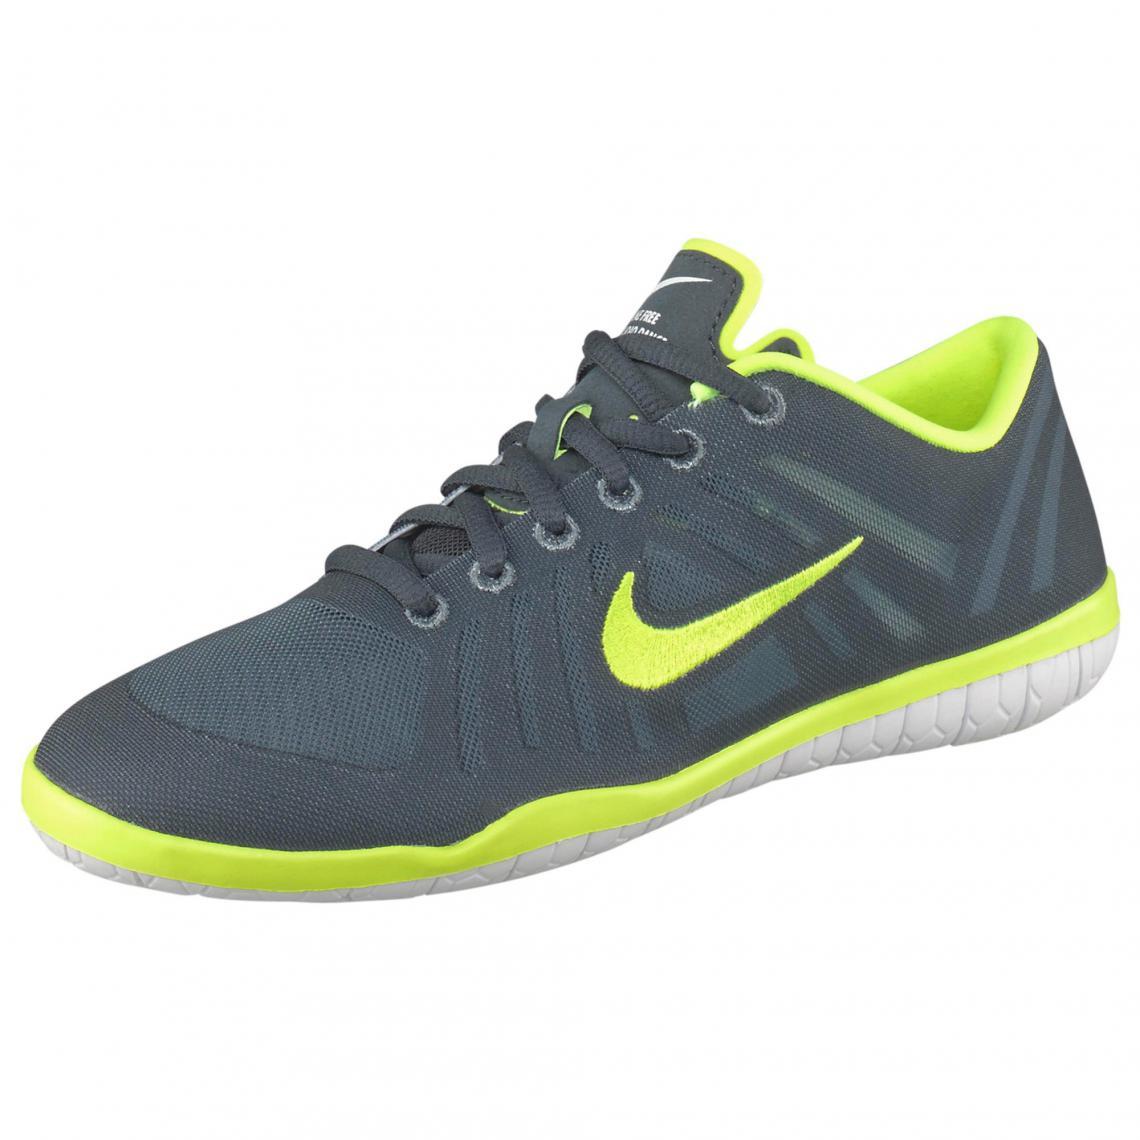 new style b2c6b 34a8b Chaussures de fitness Nike femme Free 3.0 Studio Dance Wmns - Gris Nike  Femme